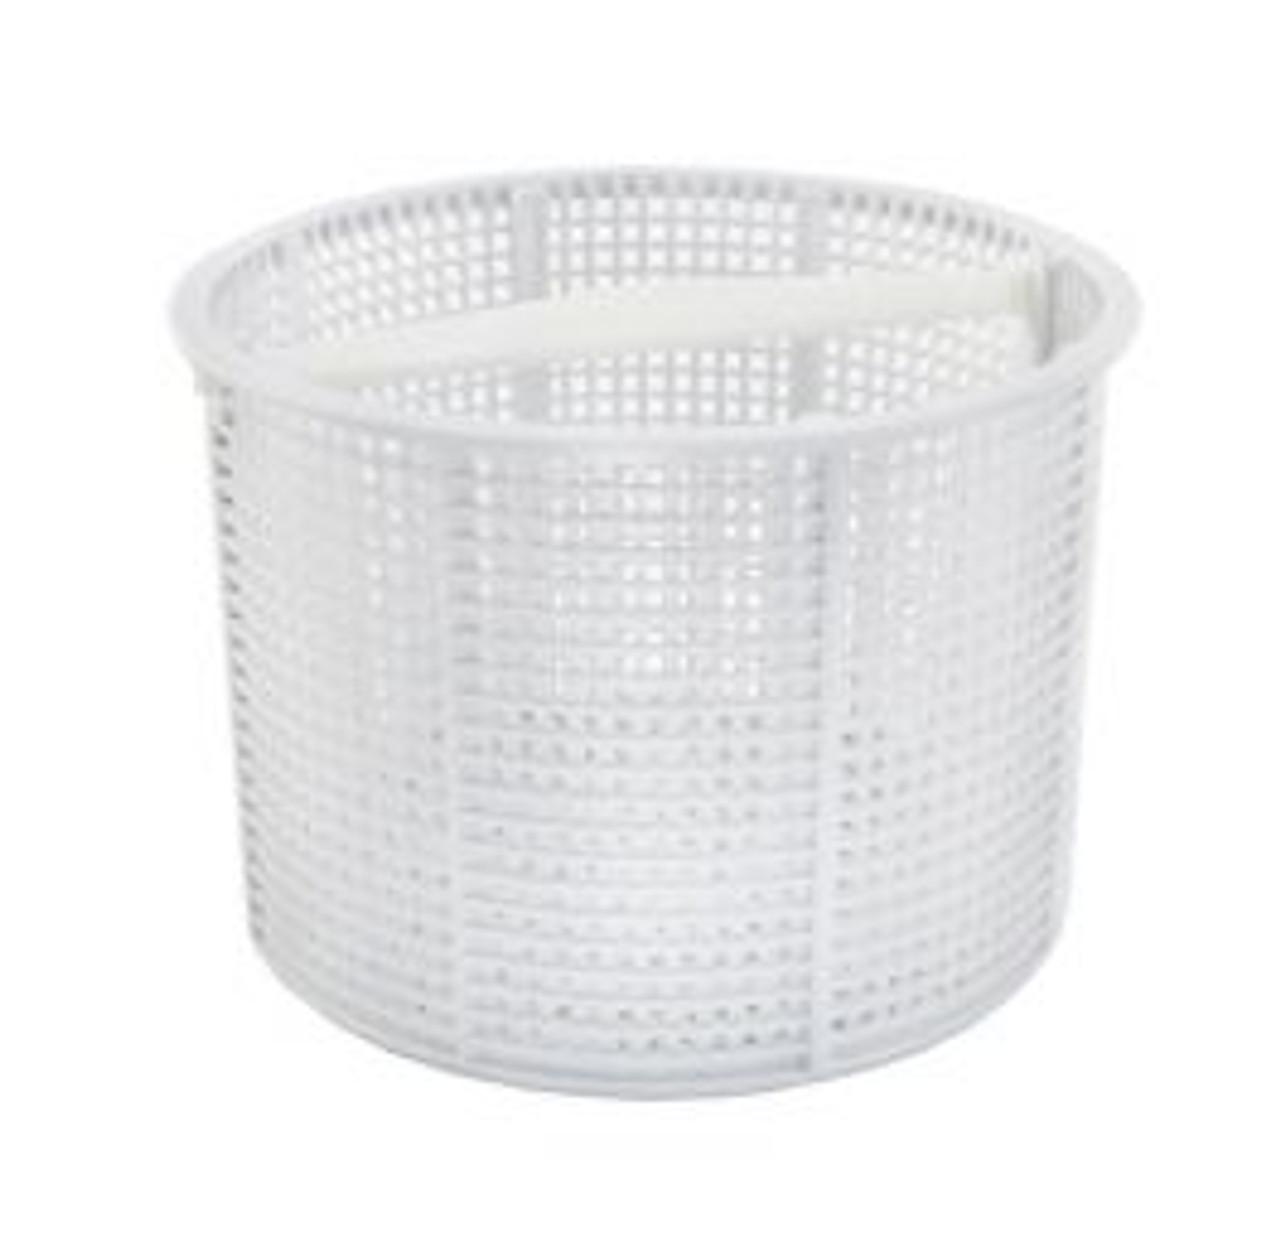 Skimmer Basket - Hayward Skimmer, Plastic 1080 Series